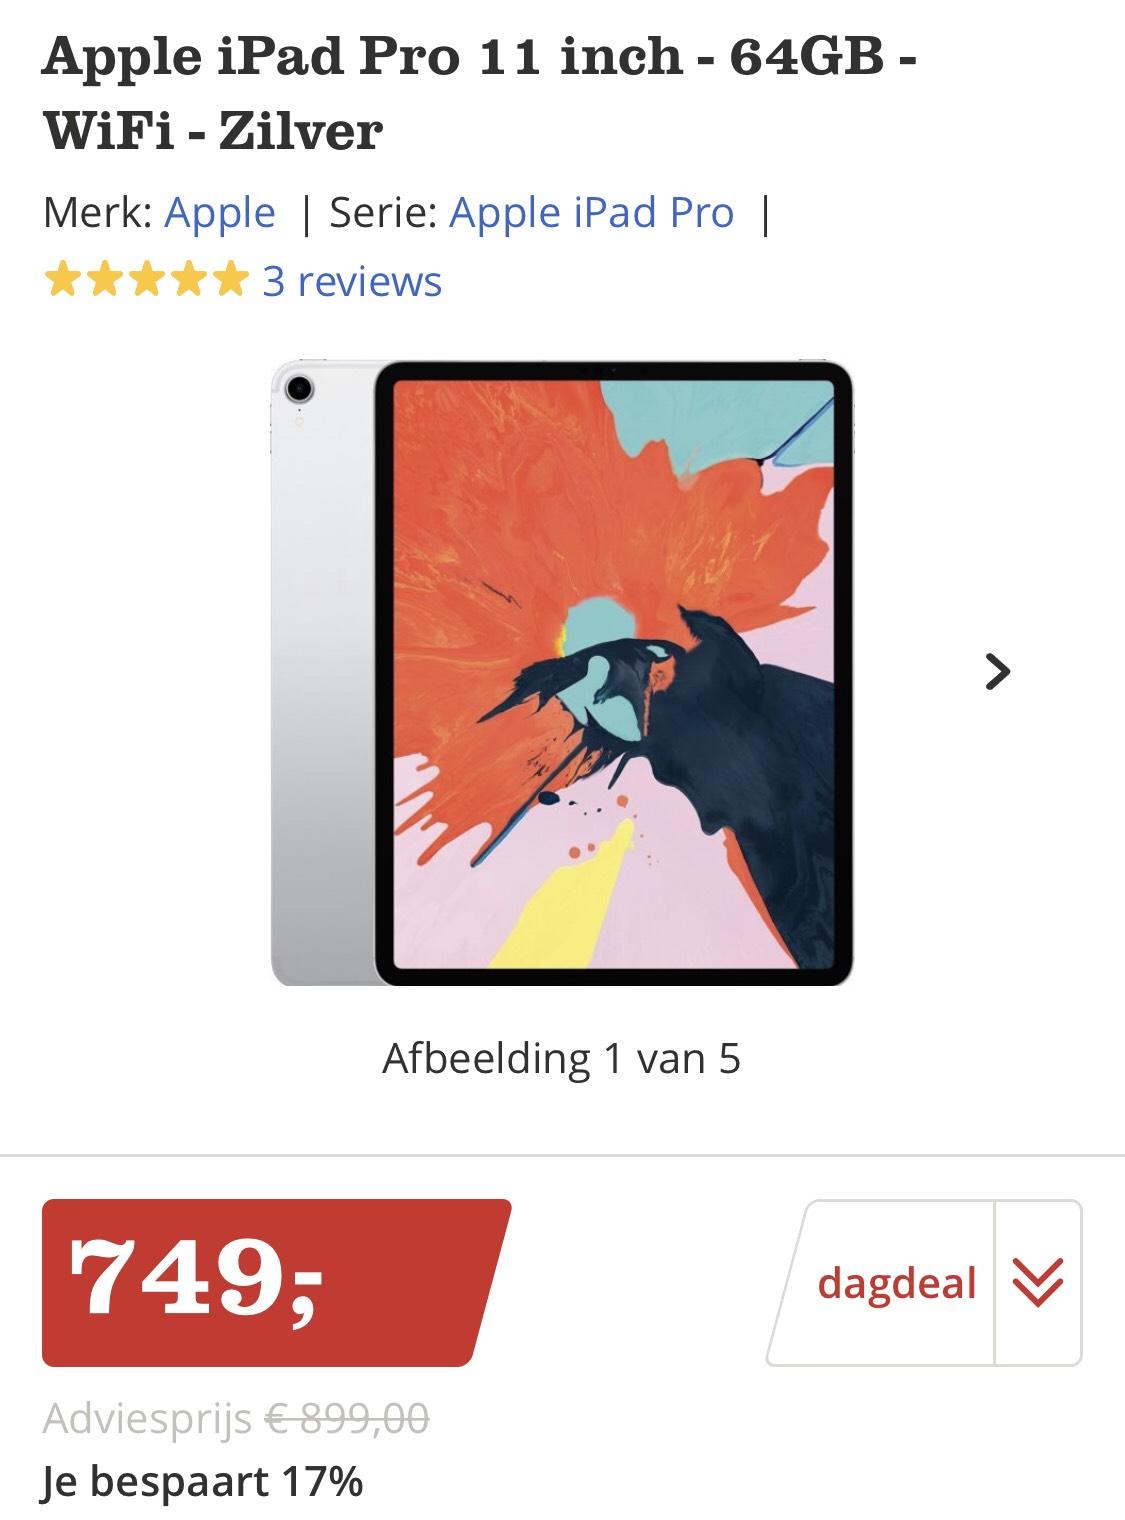 iPad Pro 11 inch - 64GB - Zilver - DAGDEAL €749